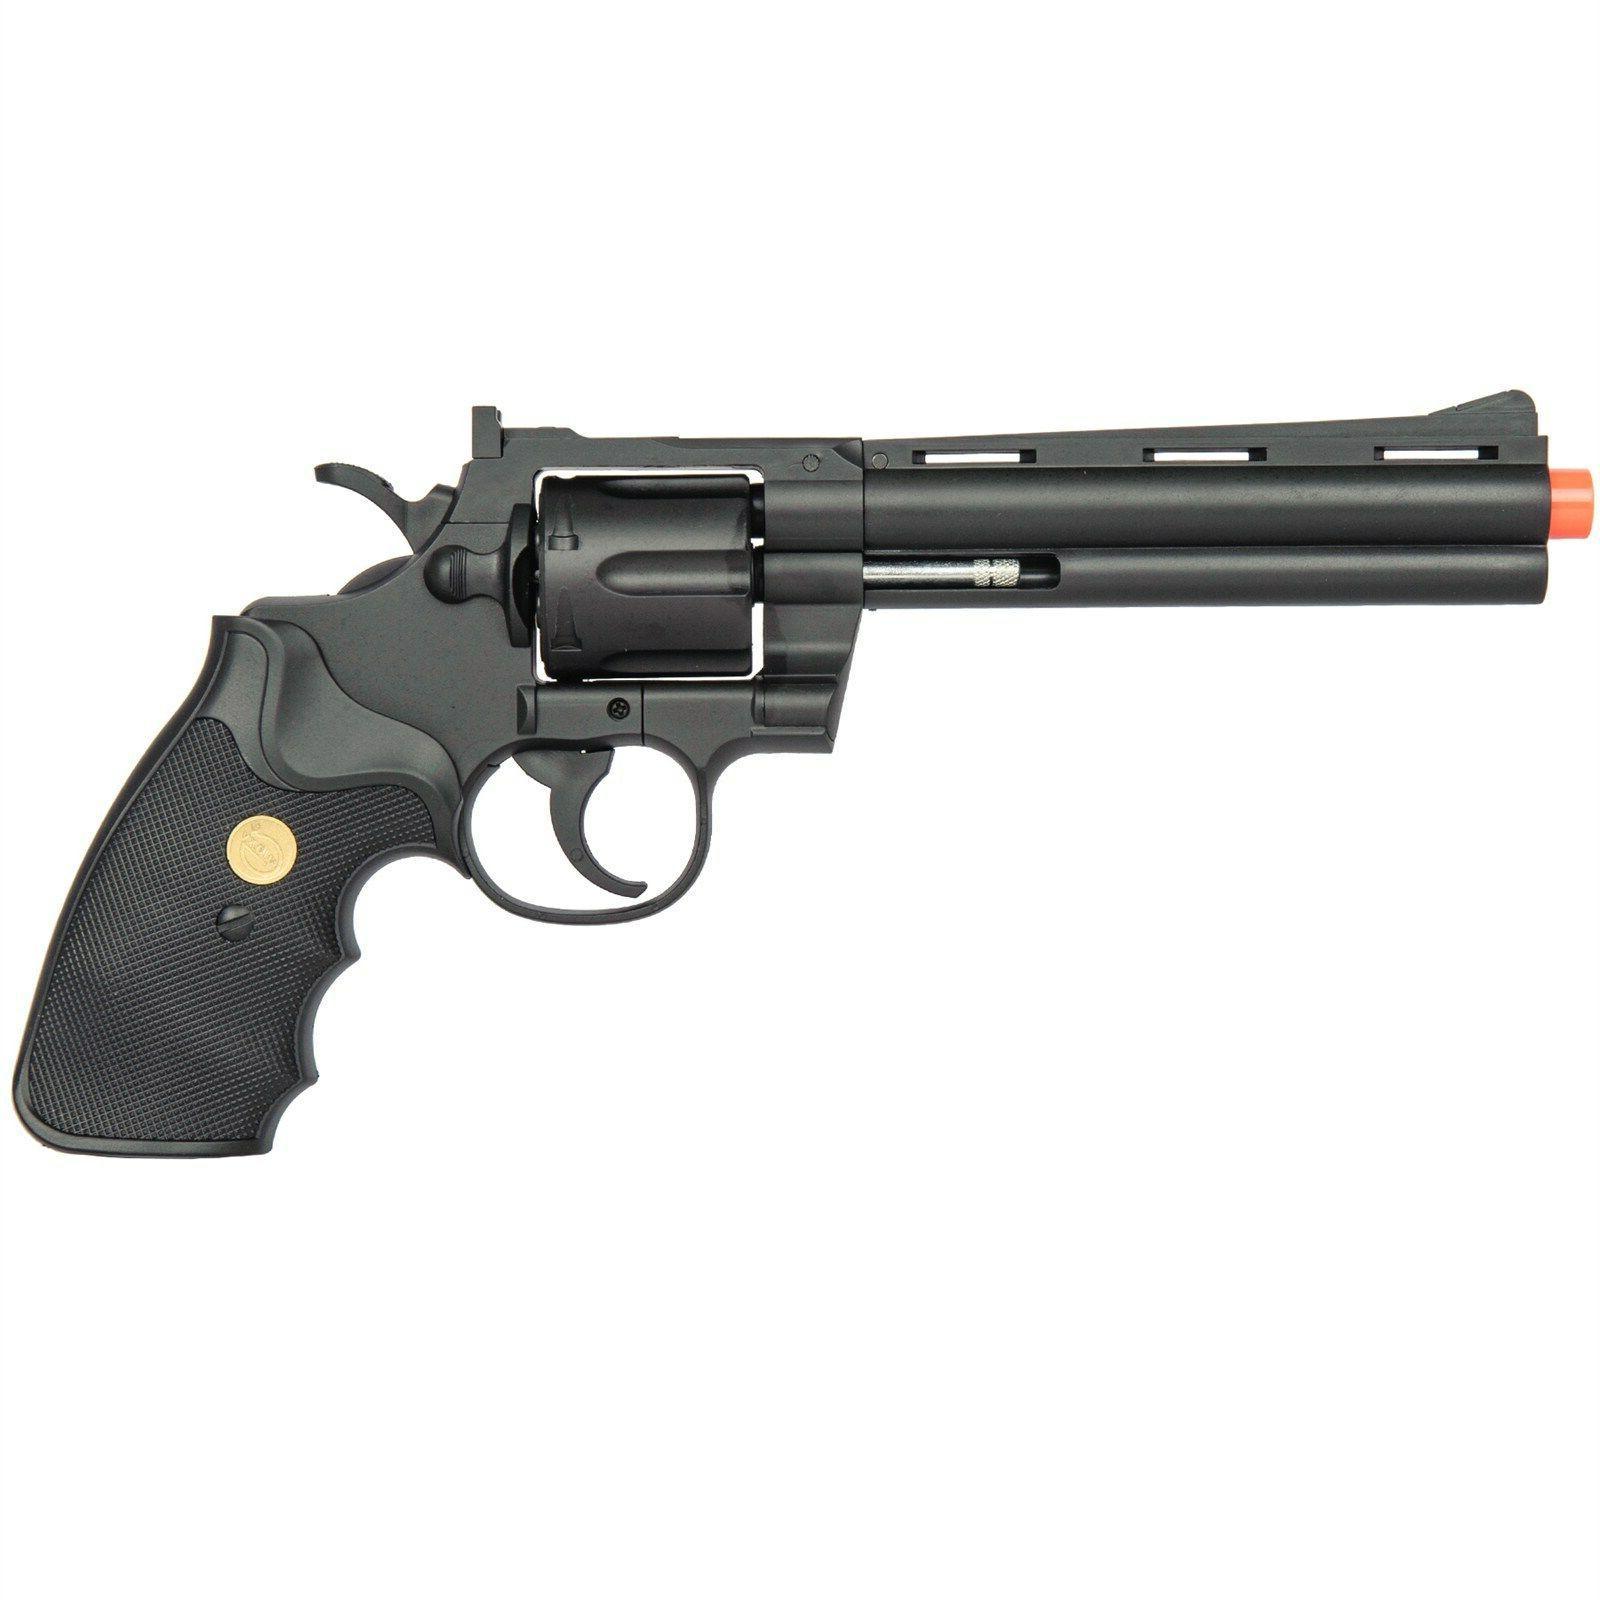 357 MAGNUM REVOLVER FULL SIZE SPRING AIRSOFT PISTOL HAND GUN